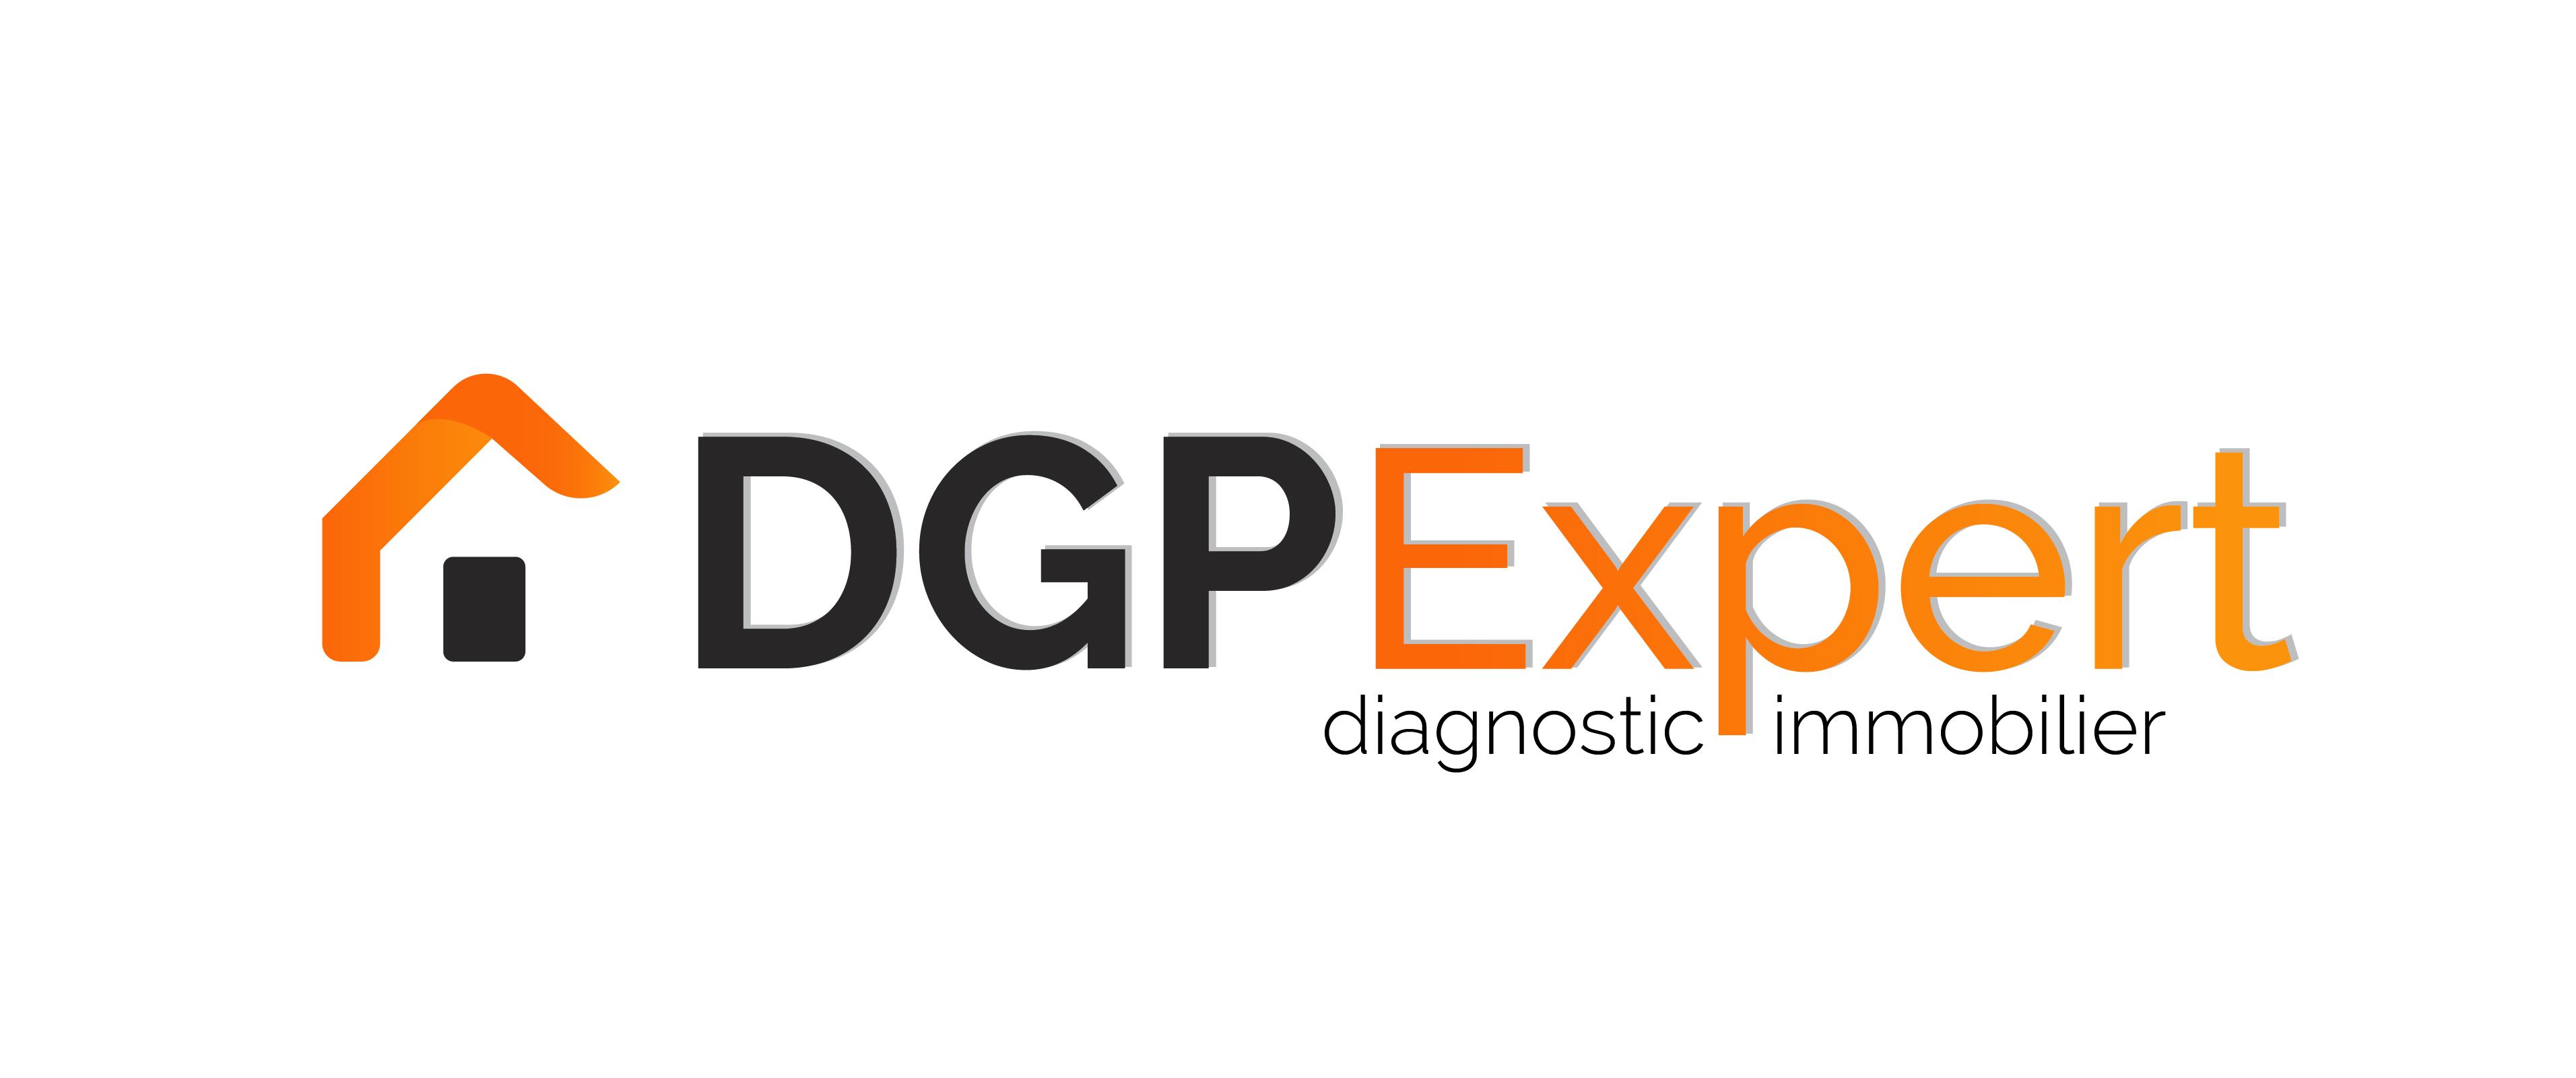 DGP EXPERT